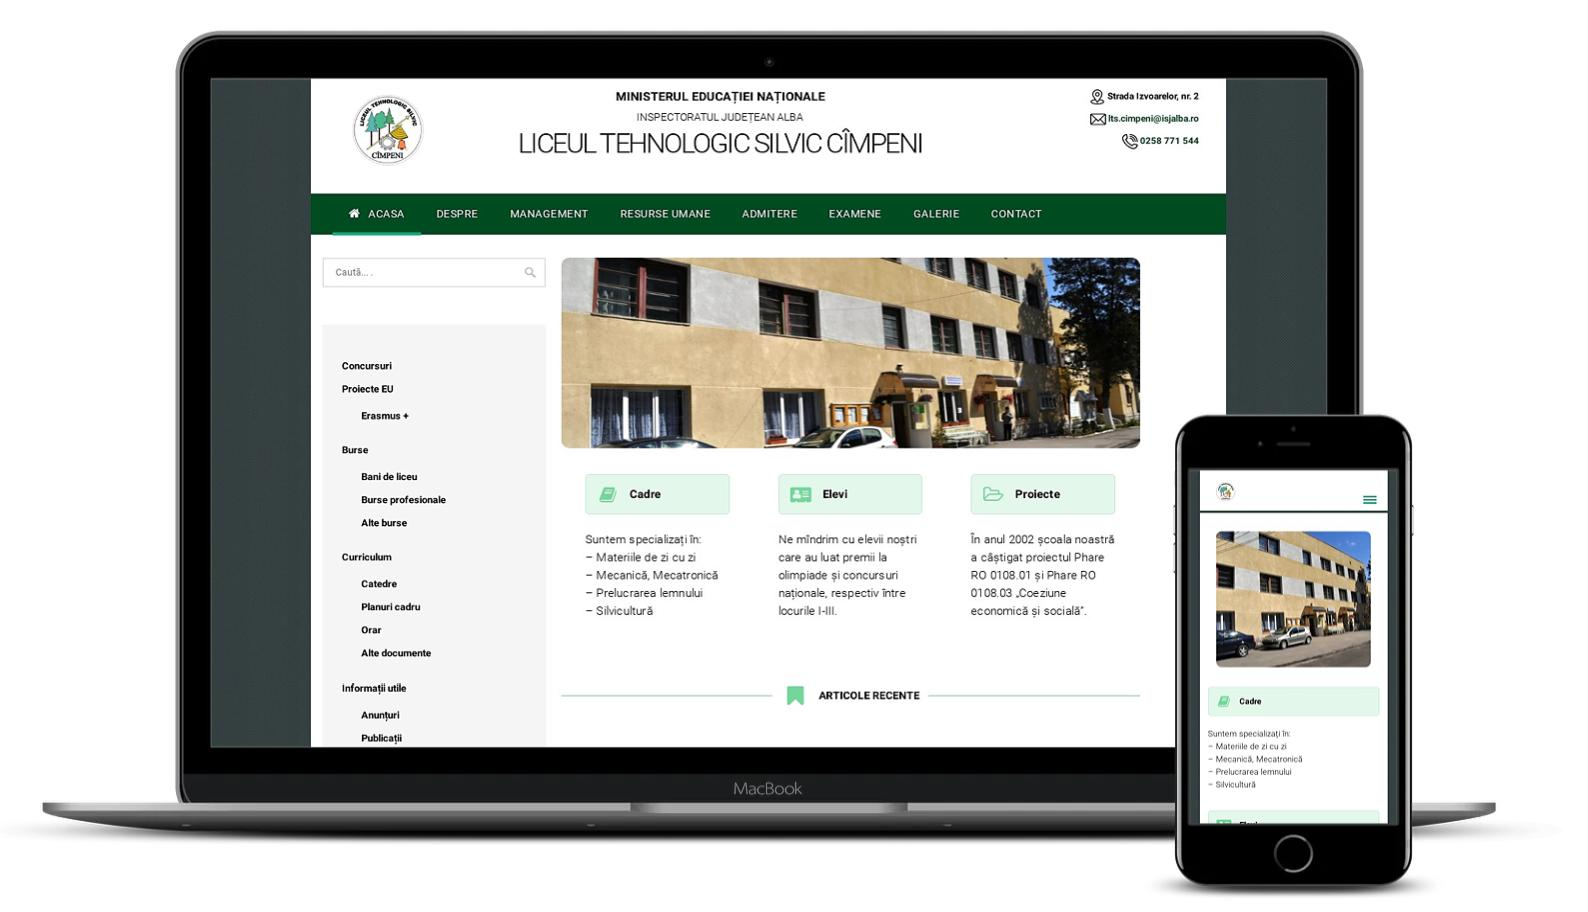 Website Liceul Tehnologic Silvic Cimpeni